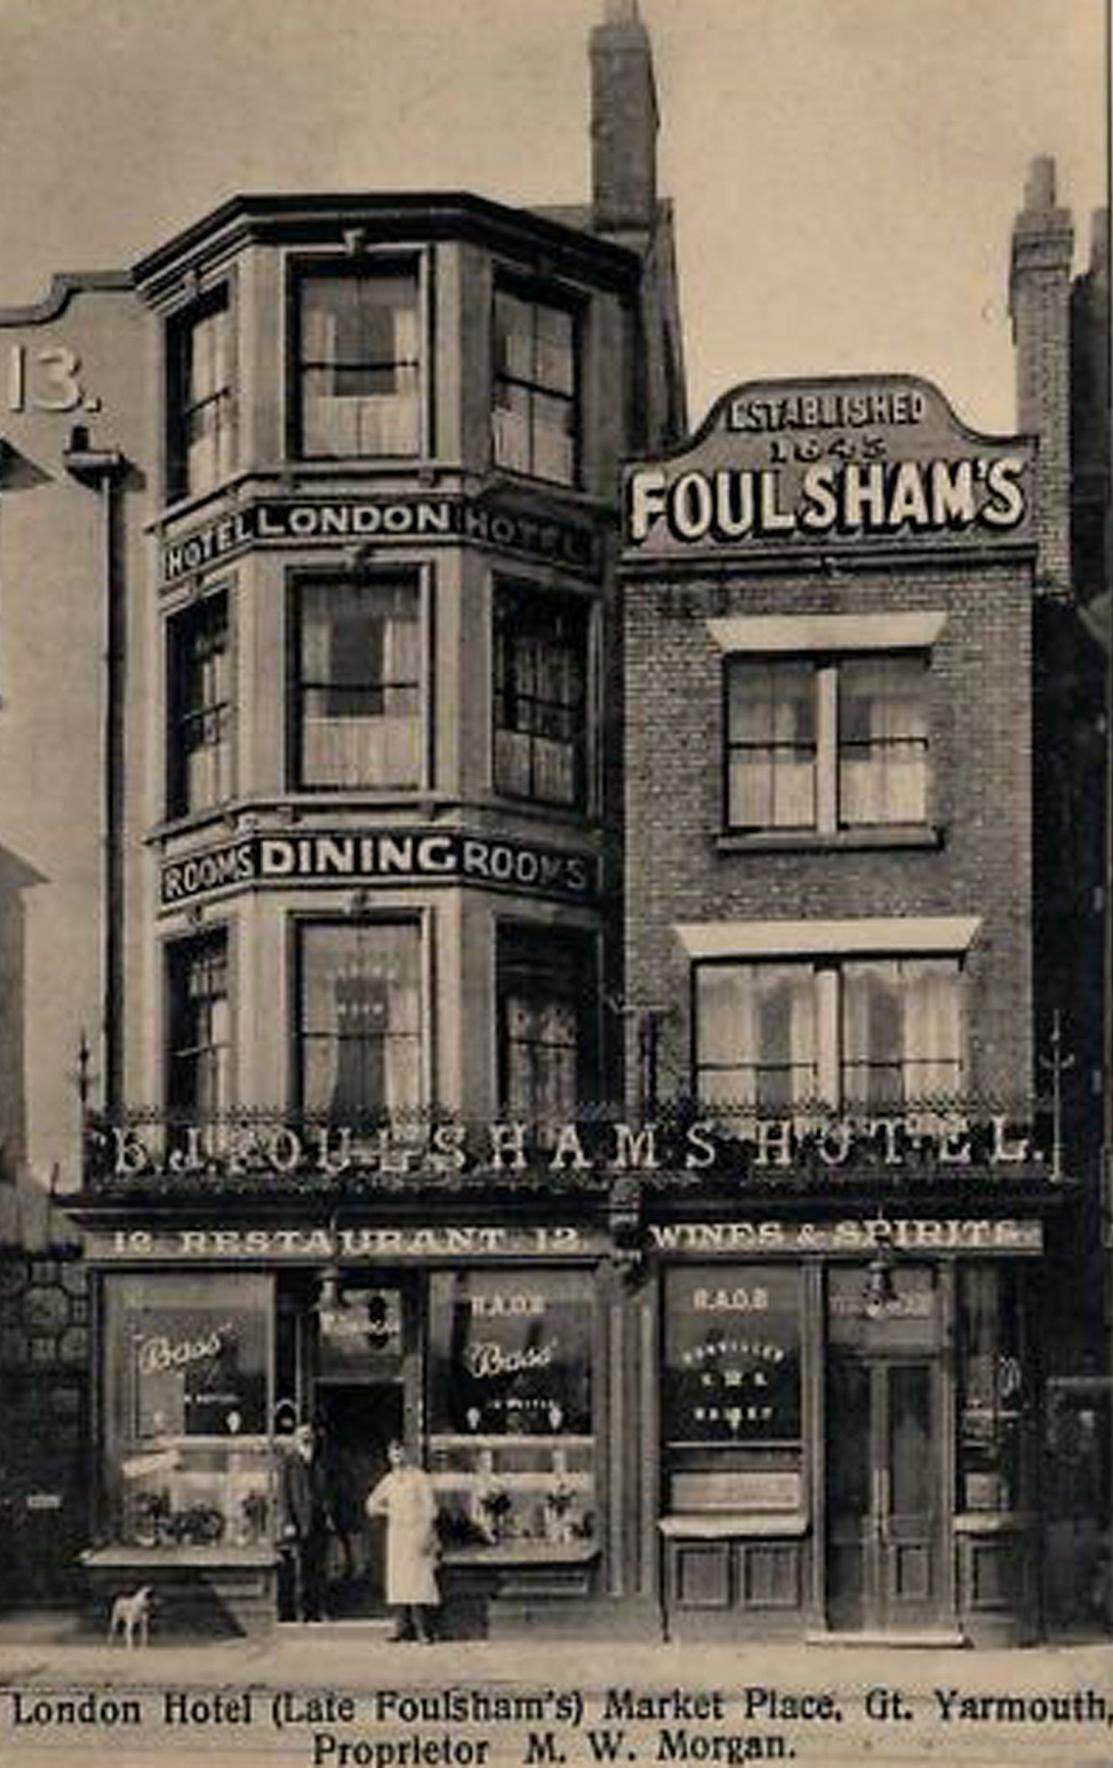 Foulshams Hotel